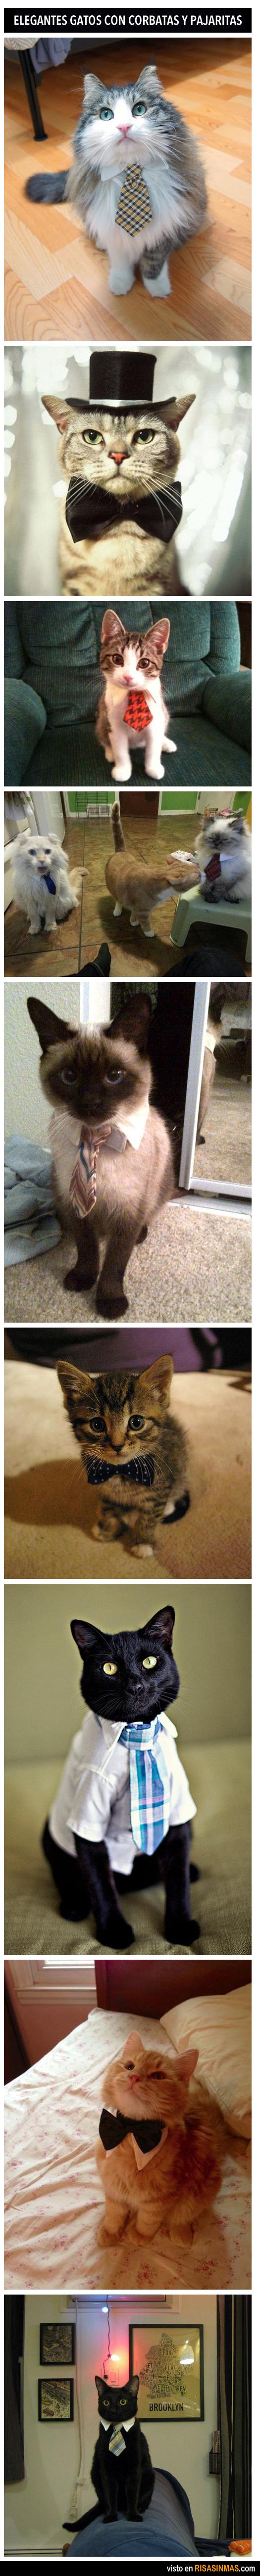 Gatos elegantes con corbatas